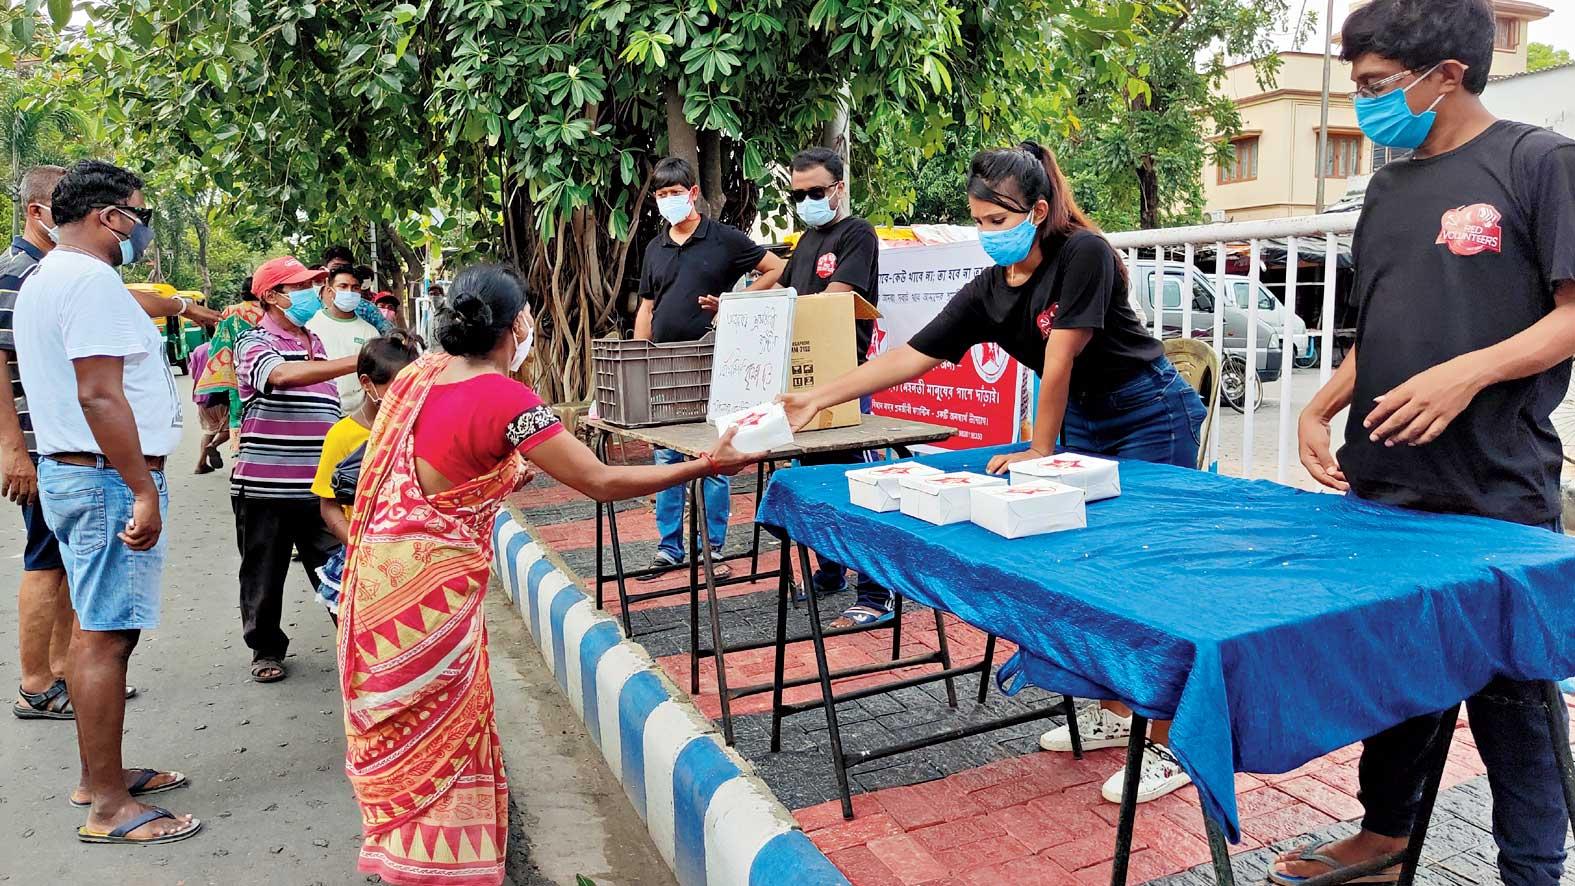 Bidhannagar Shramjibi Canteen volunteers serve lunch at Route 206 bus terminus in AJ Block.